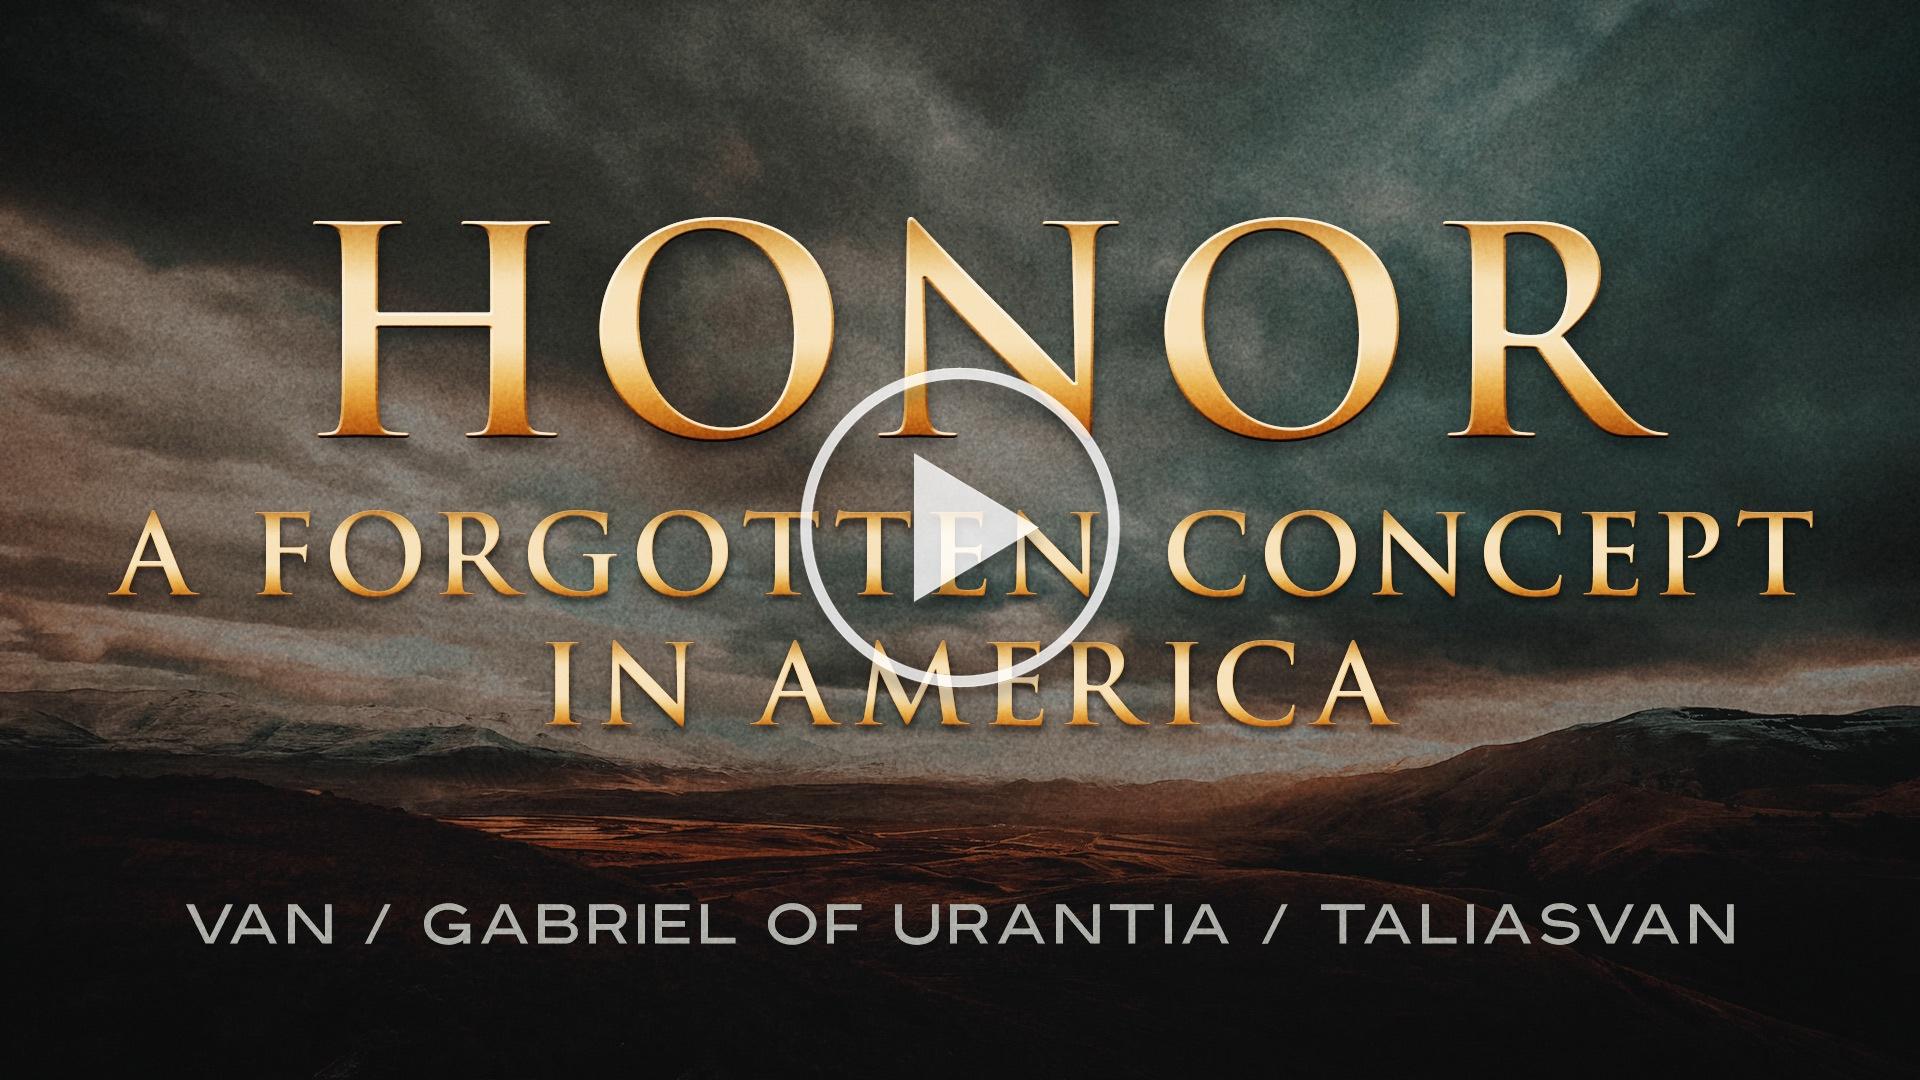 Honor, A Forgotten Concept In America by Van / Gabriel of Urantia / TaliasVan